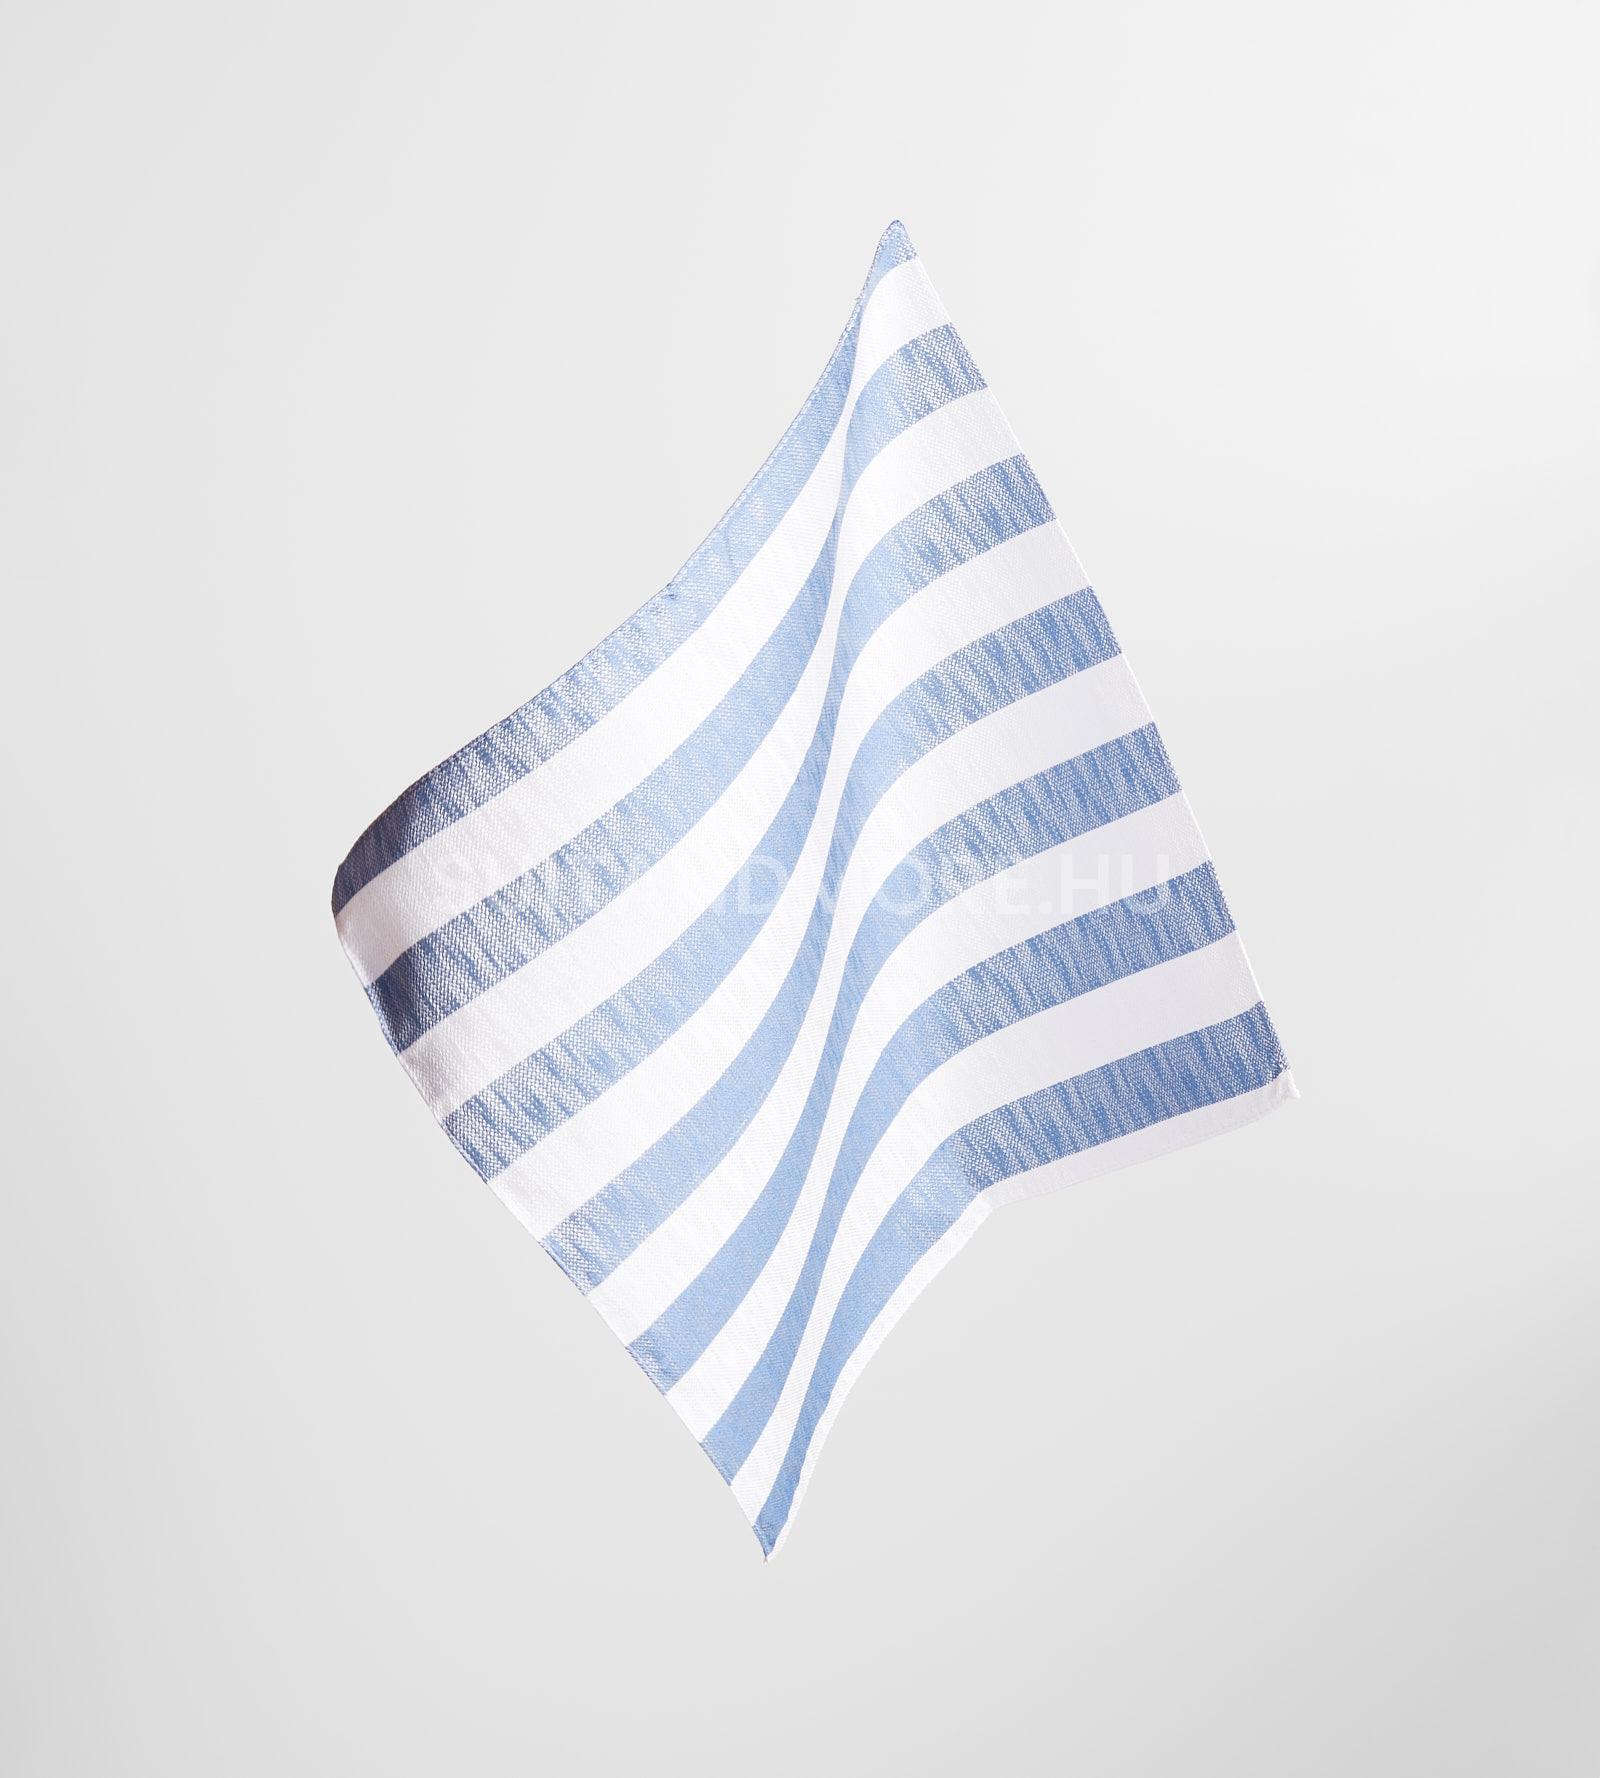 digel-kek-feher-csikos-selyem-diszzsebkendo-gabor-1179102-24-01